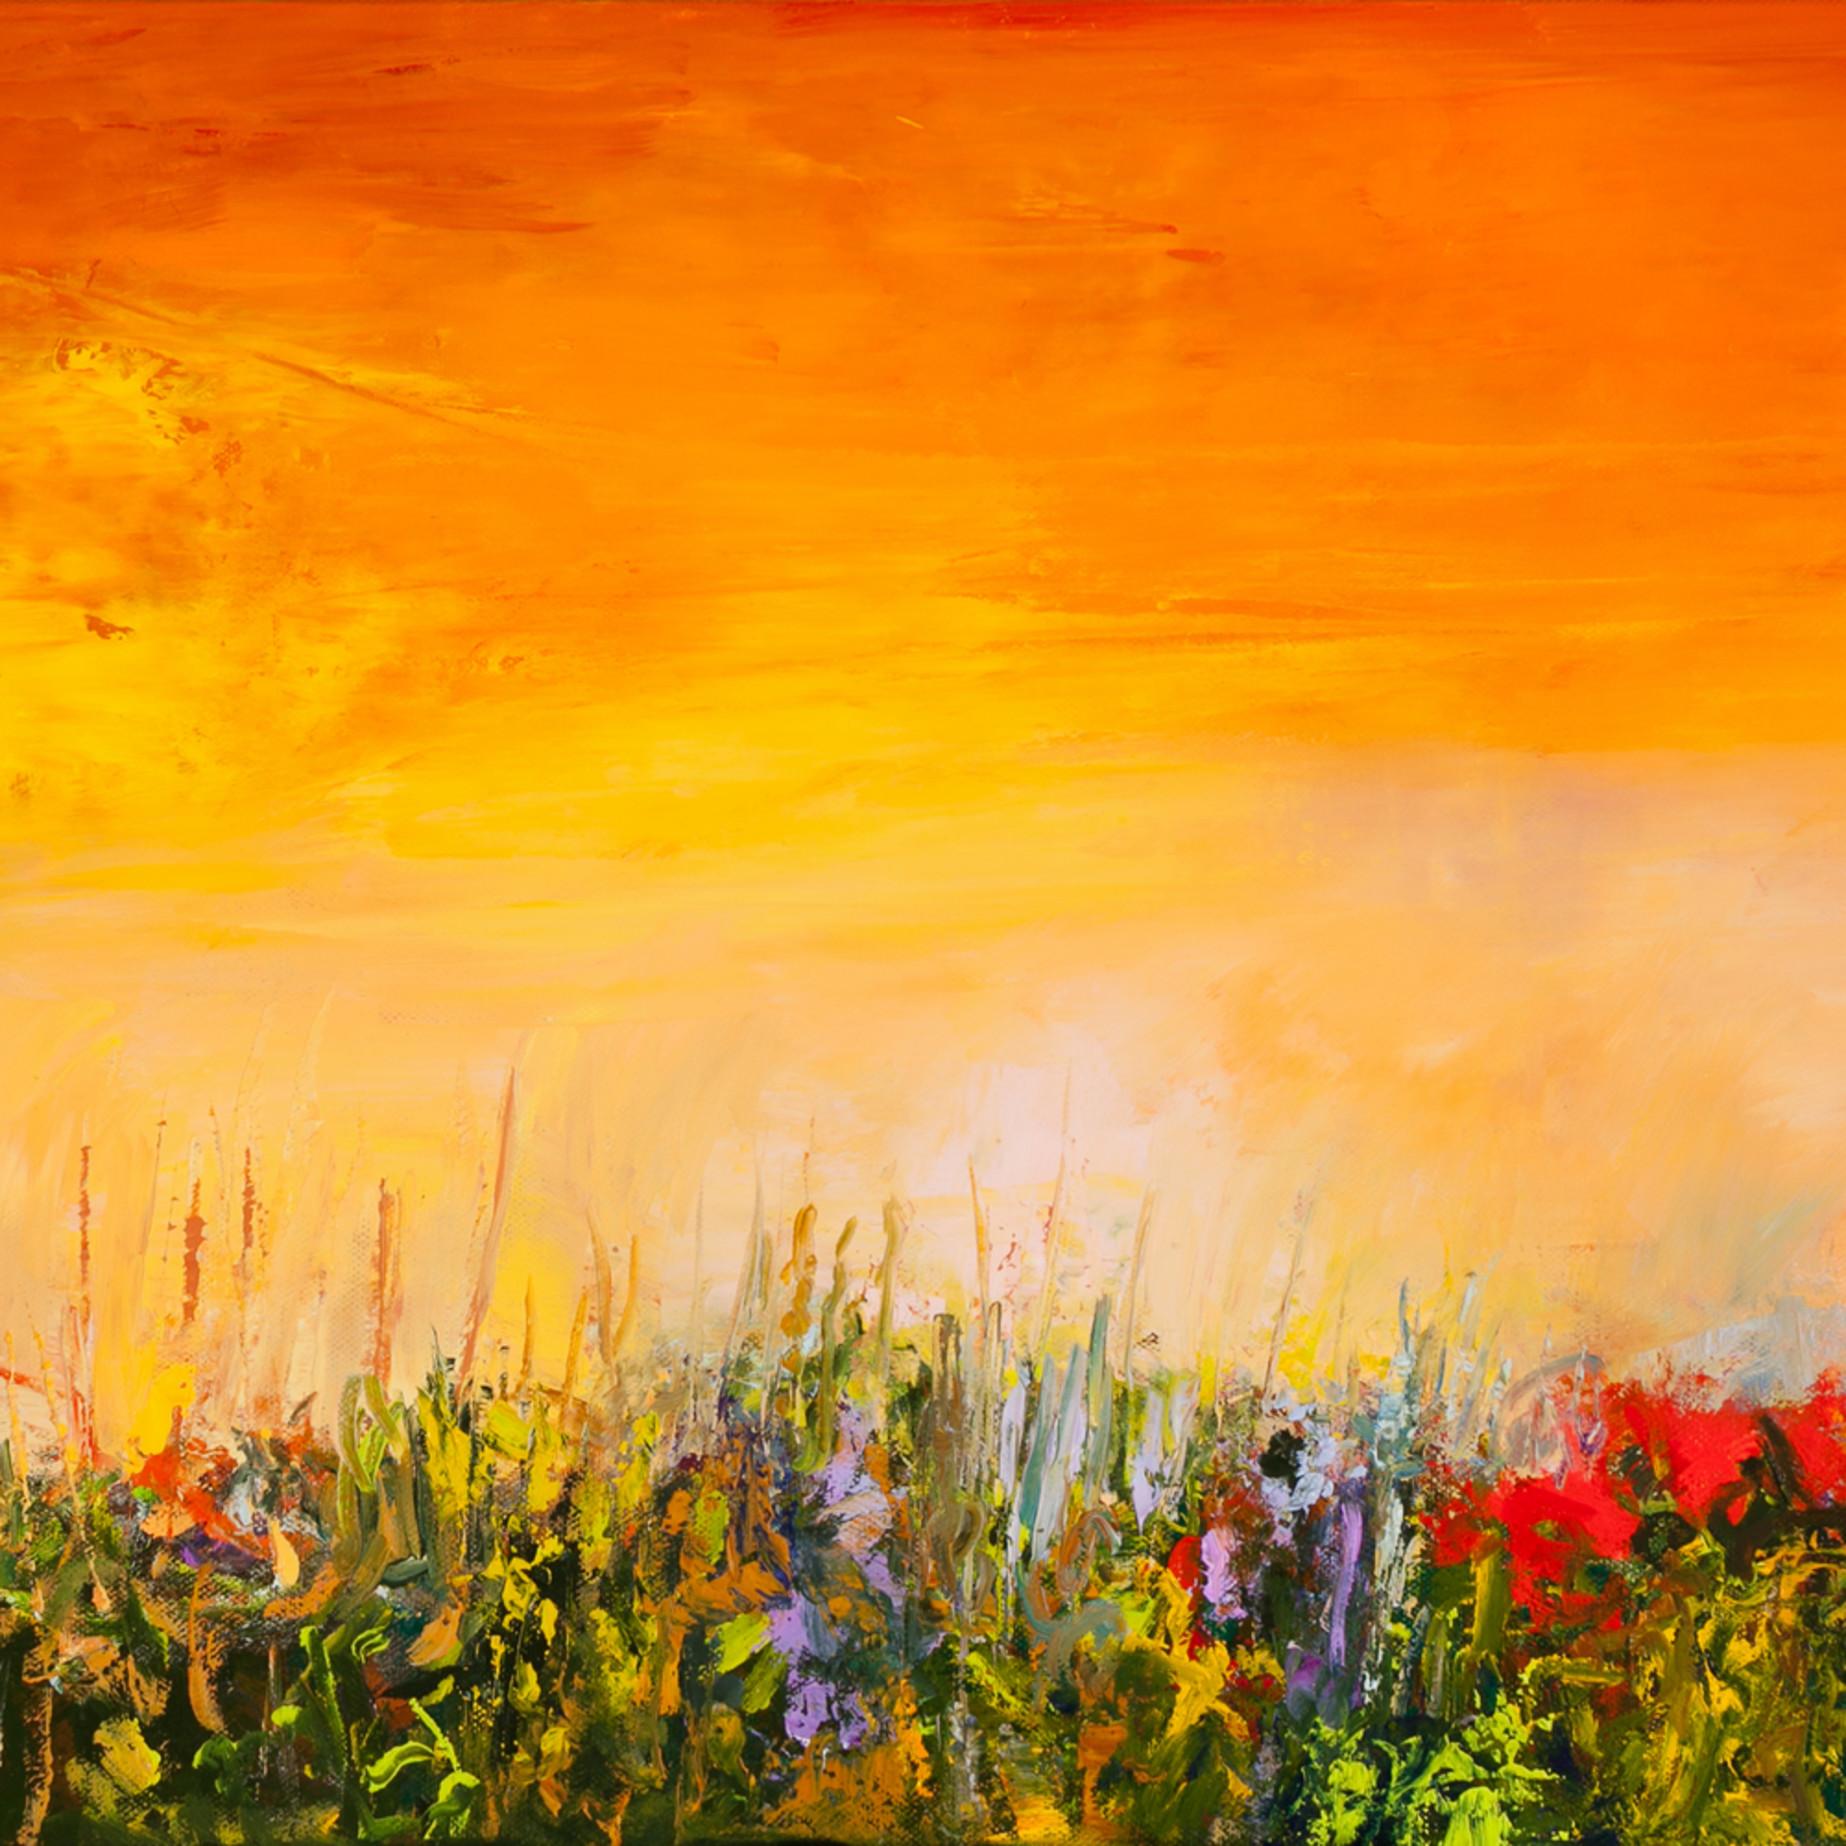 Tracy lynn pristas original sold wall art prints prairie rush zxwfrj